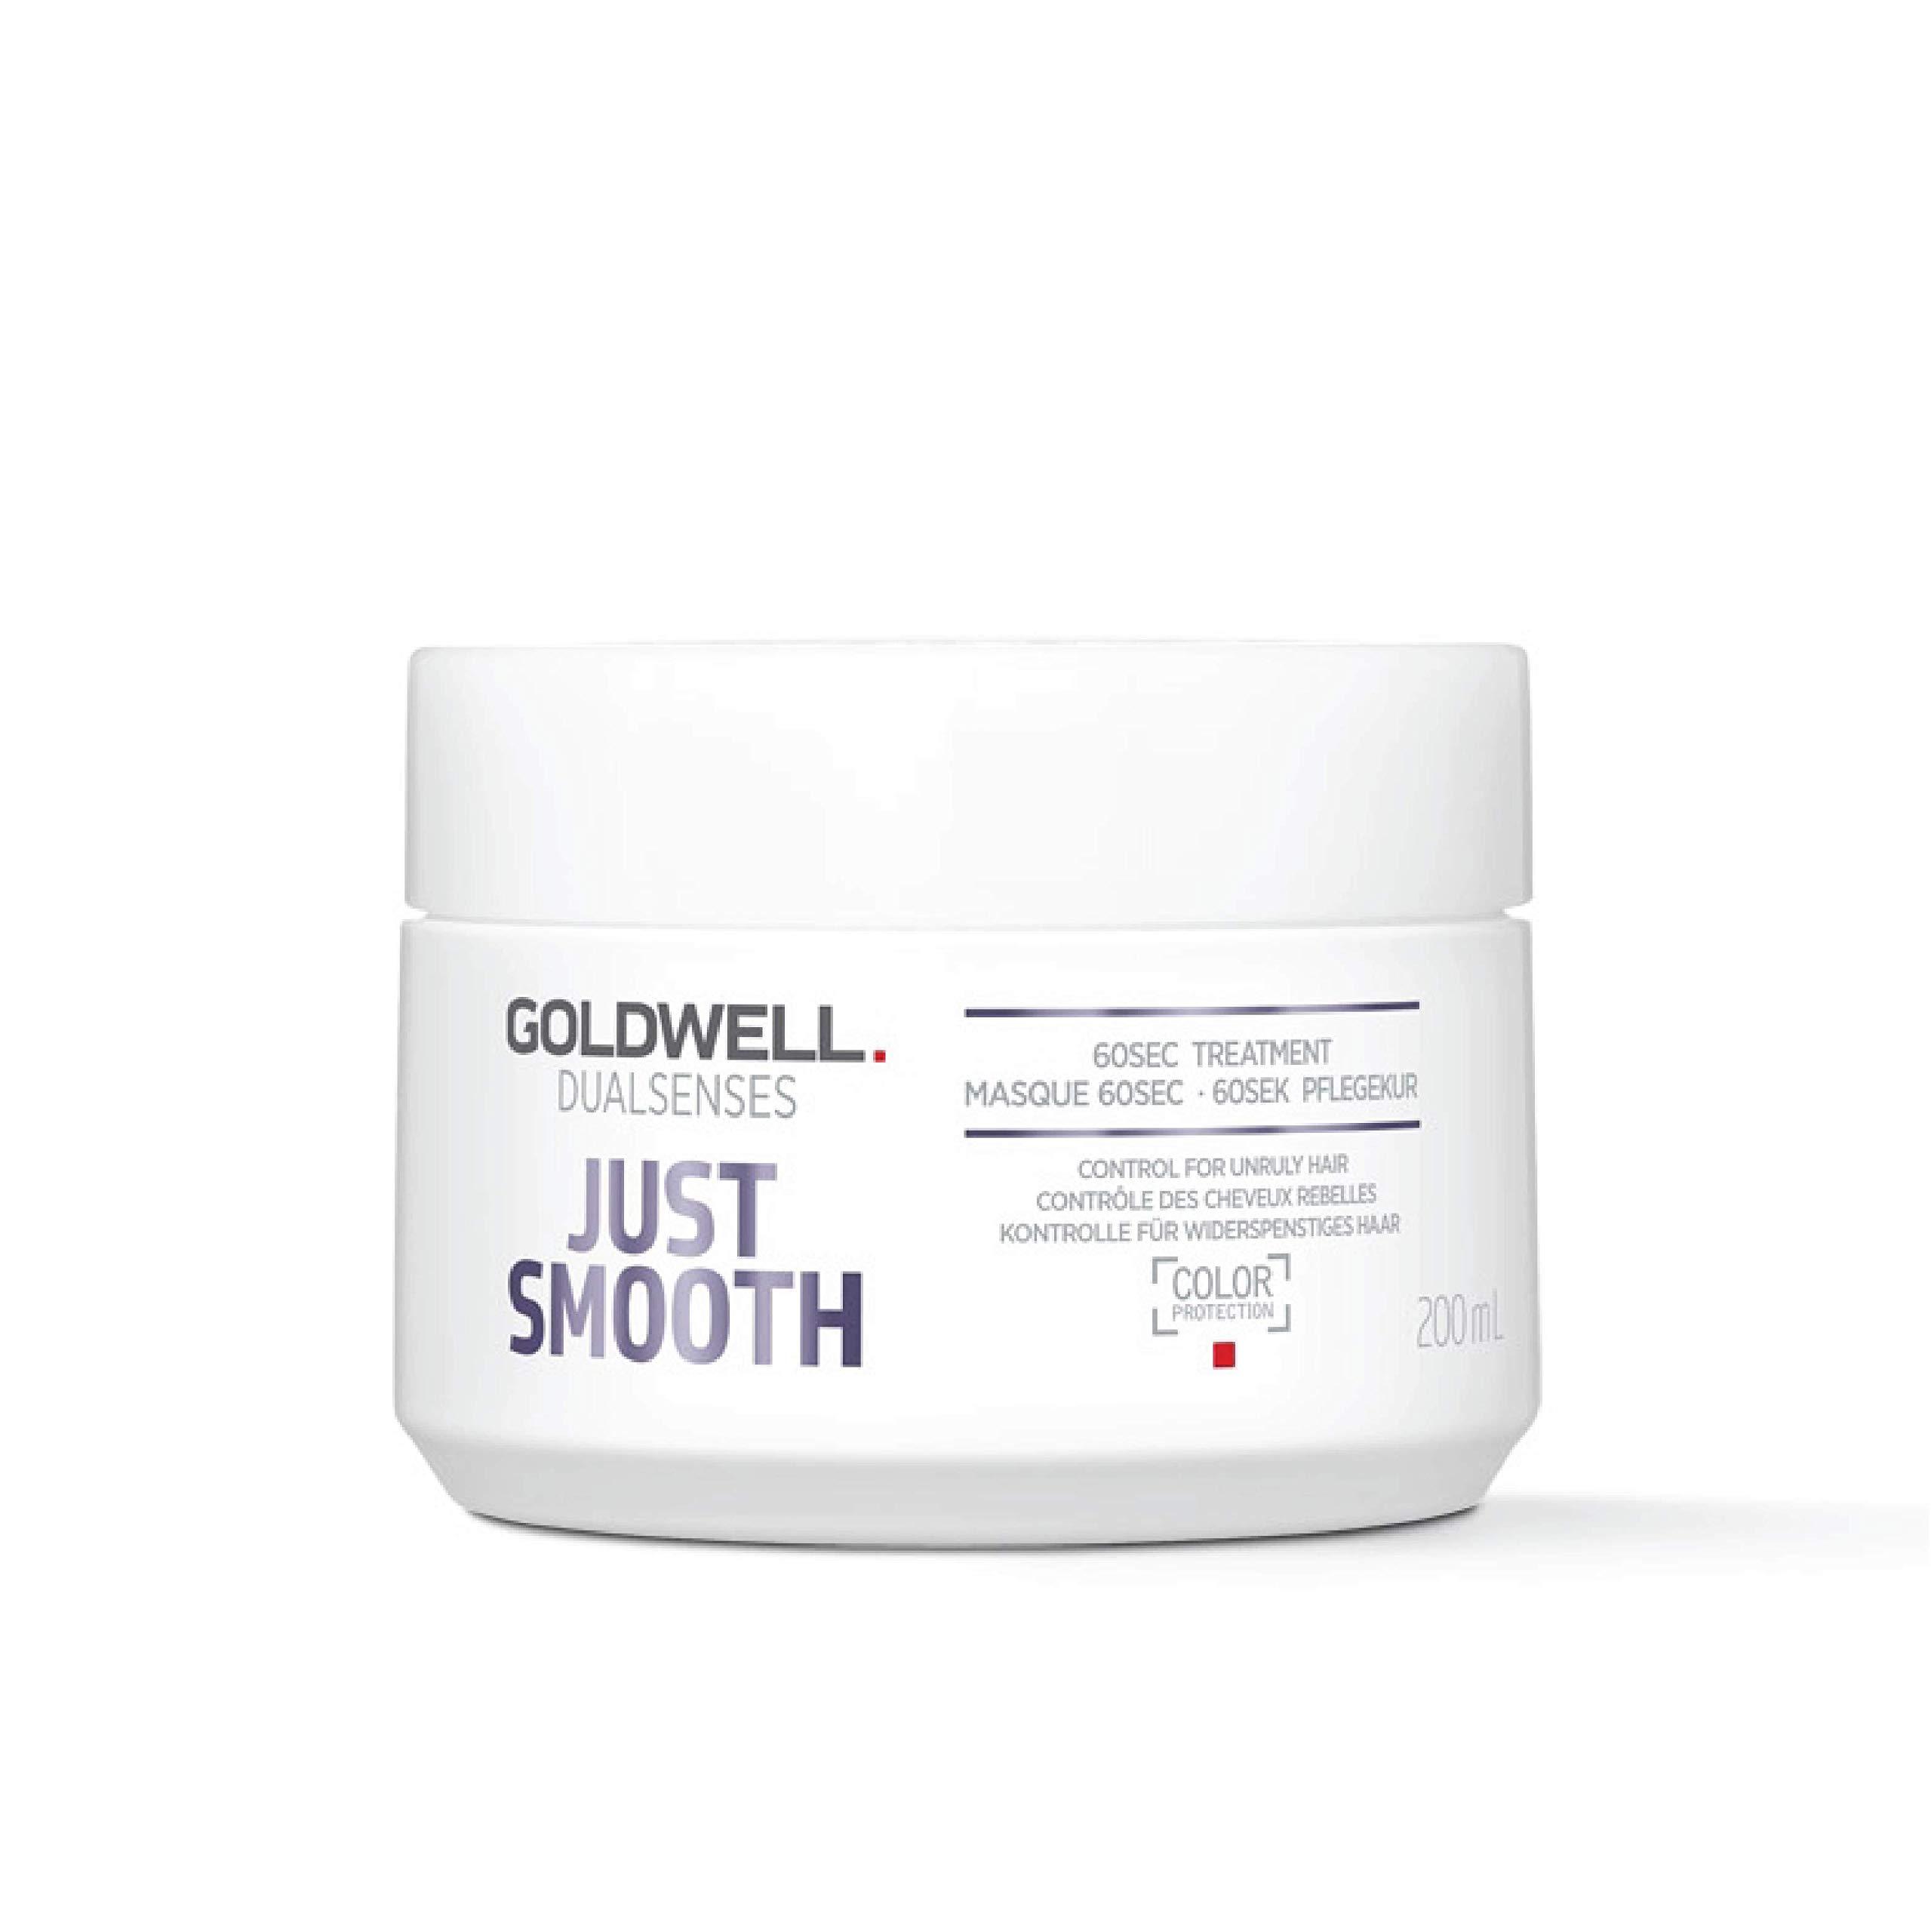 Goldwell Dual Senses Just Smooth 60S Treatment 200ml